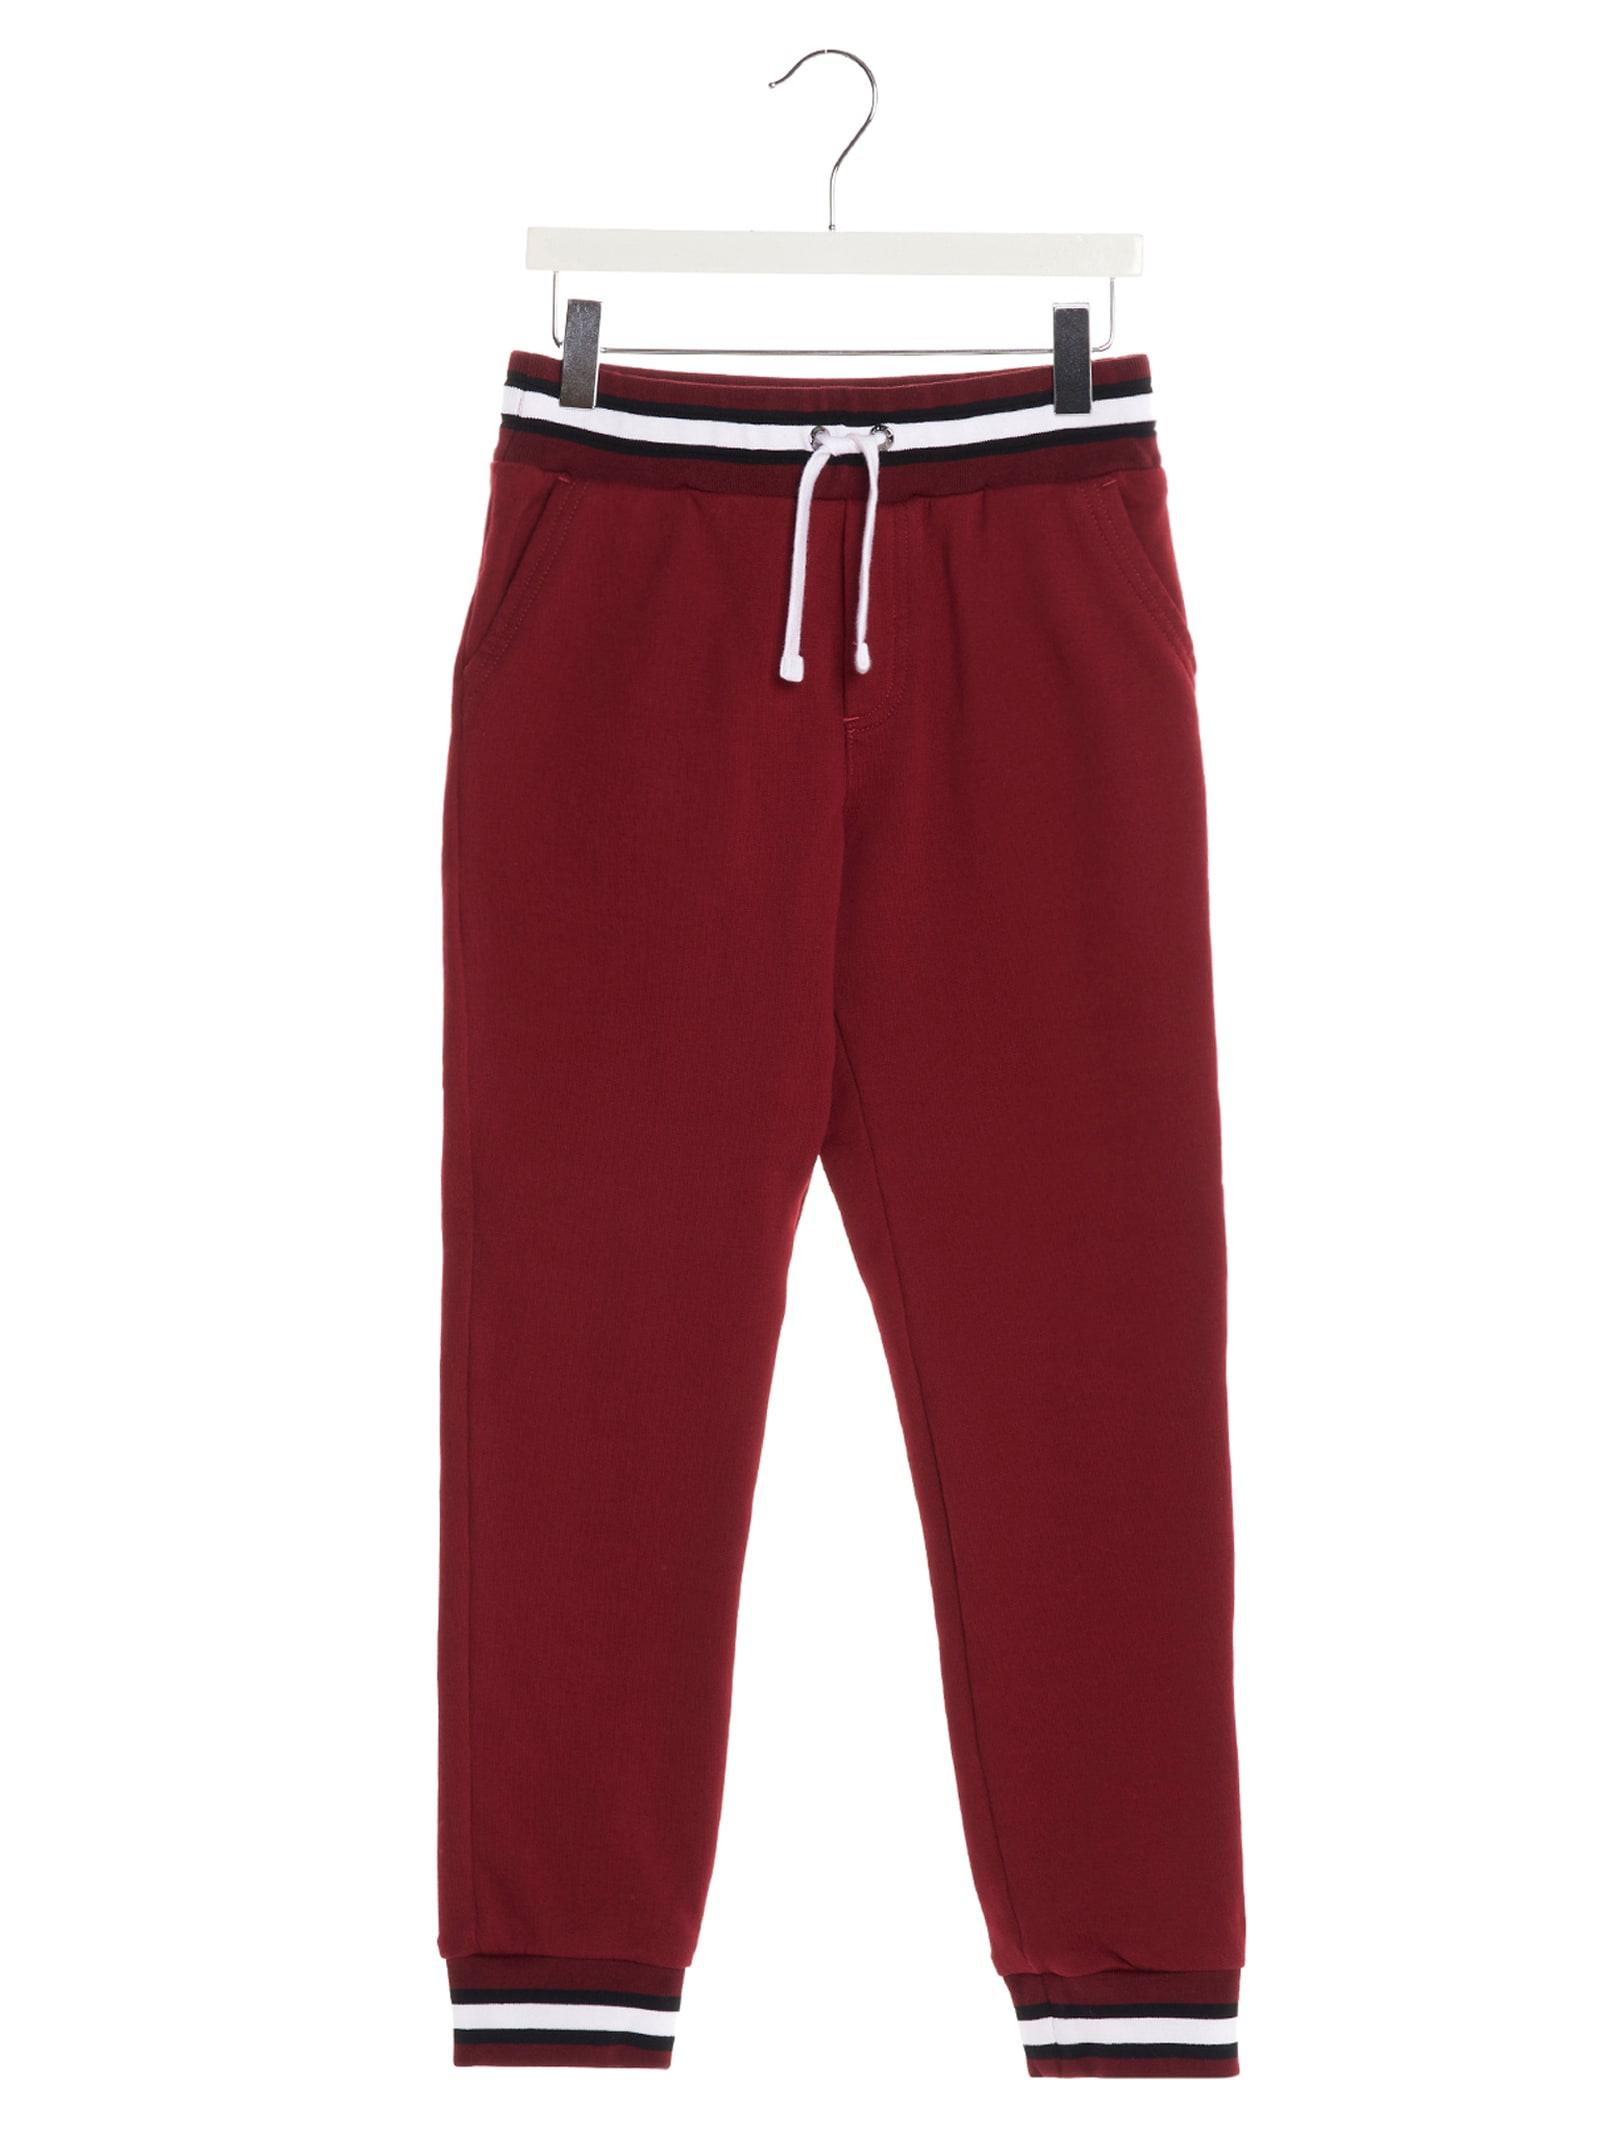 Dolce & Gabbana Pants